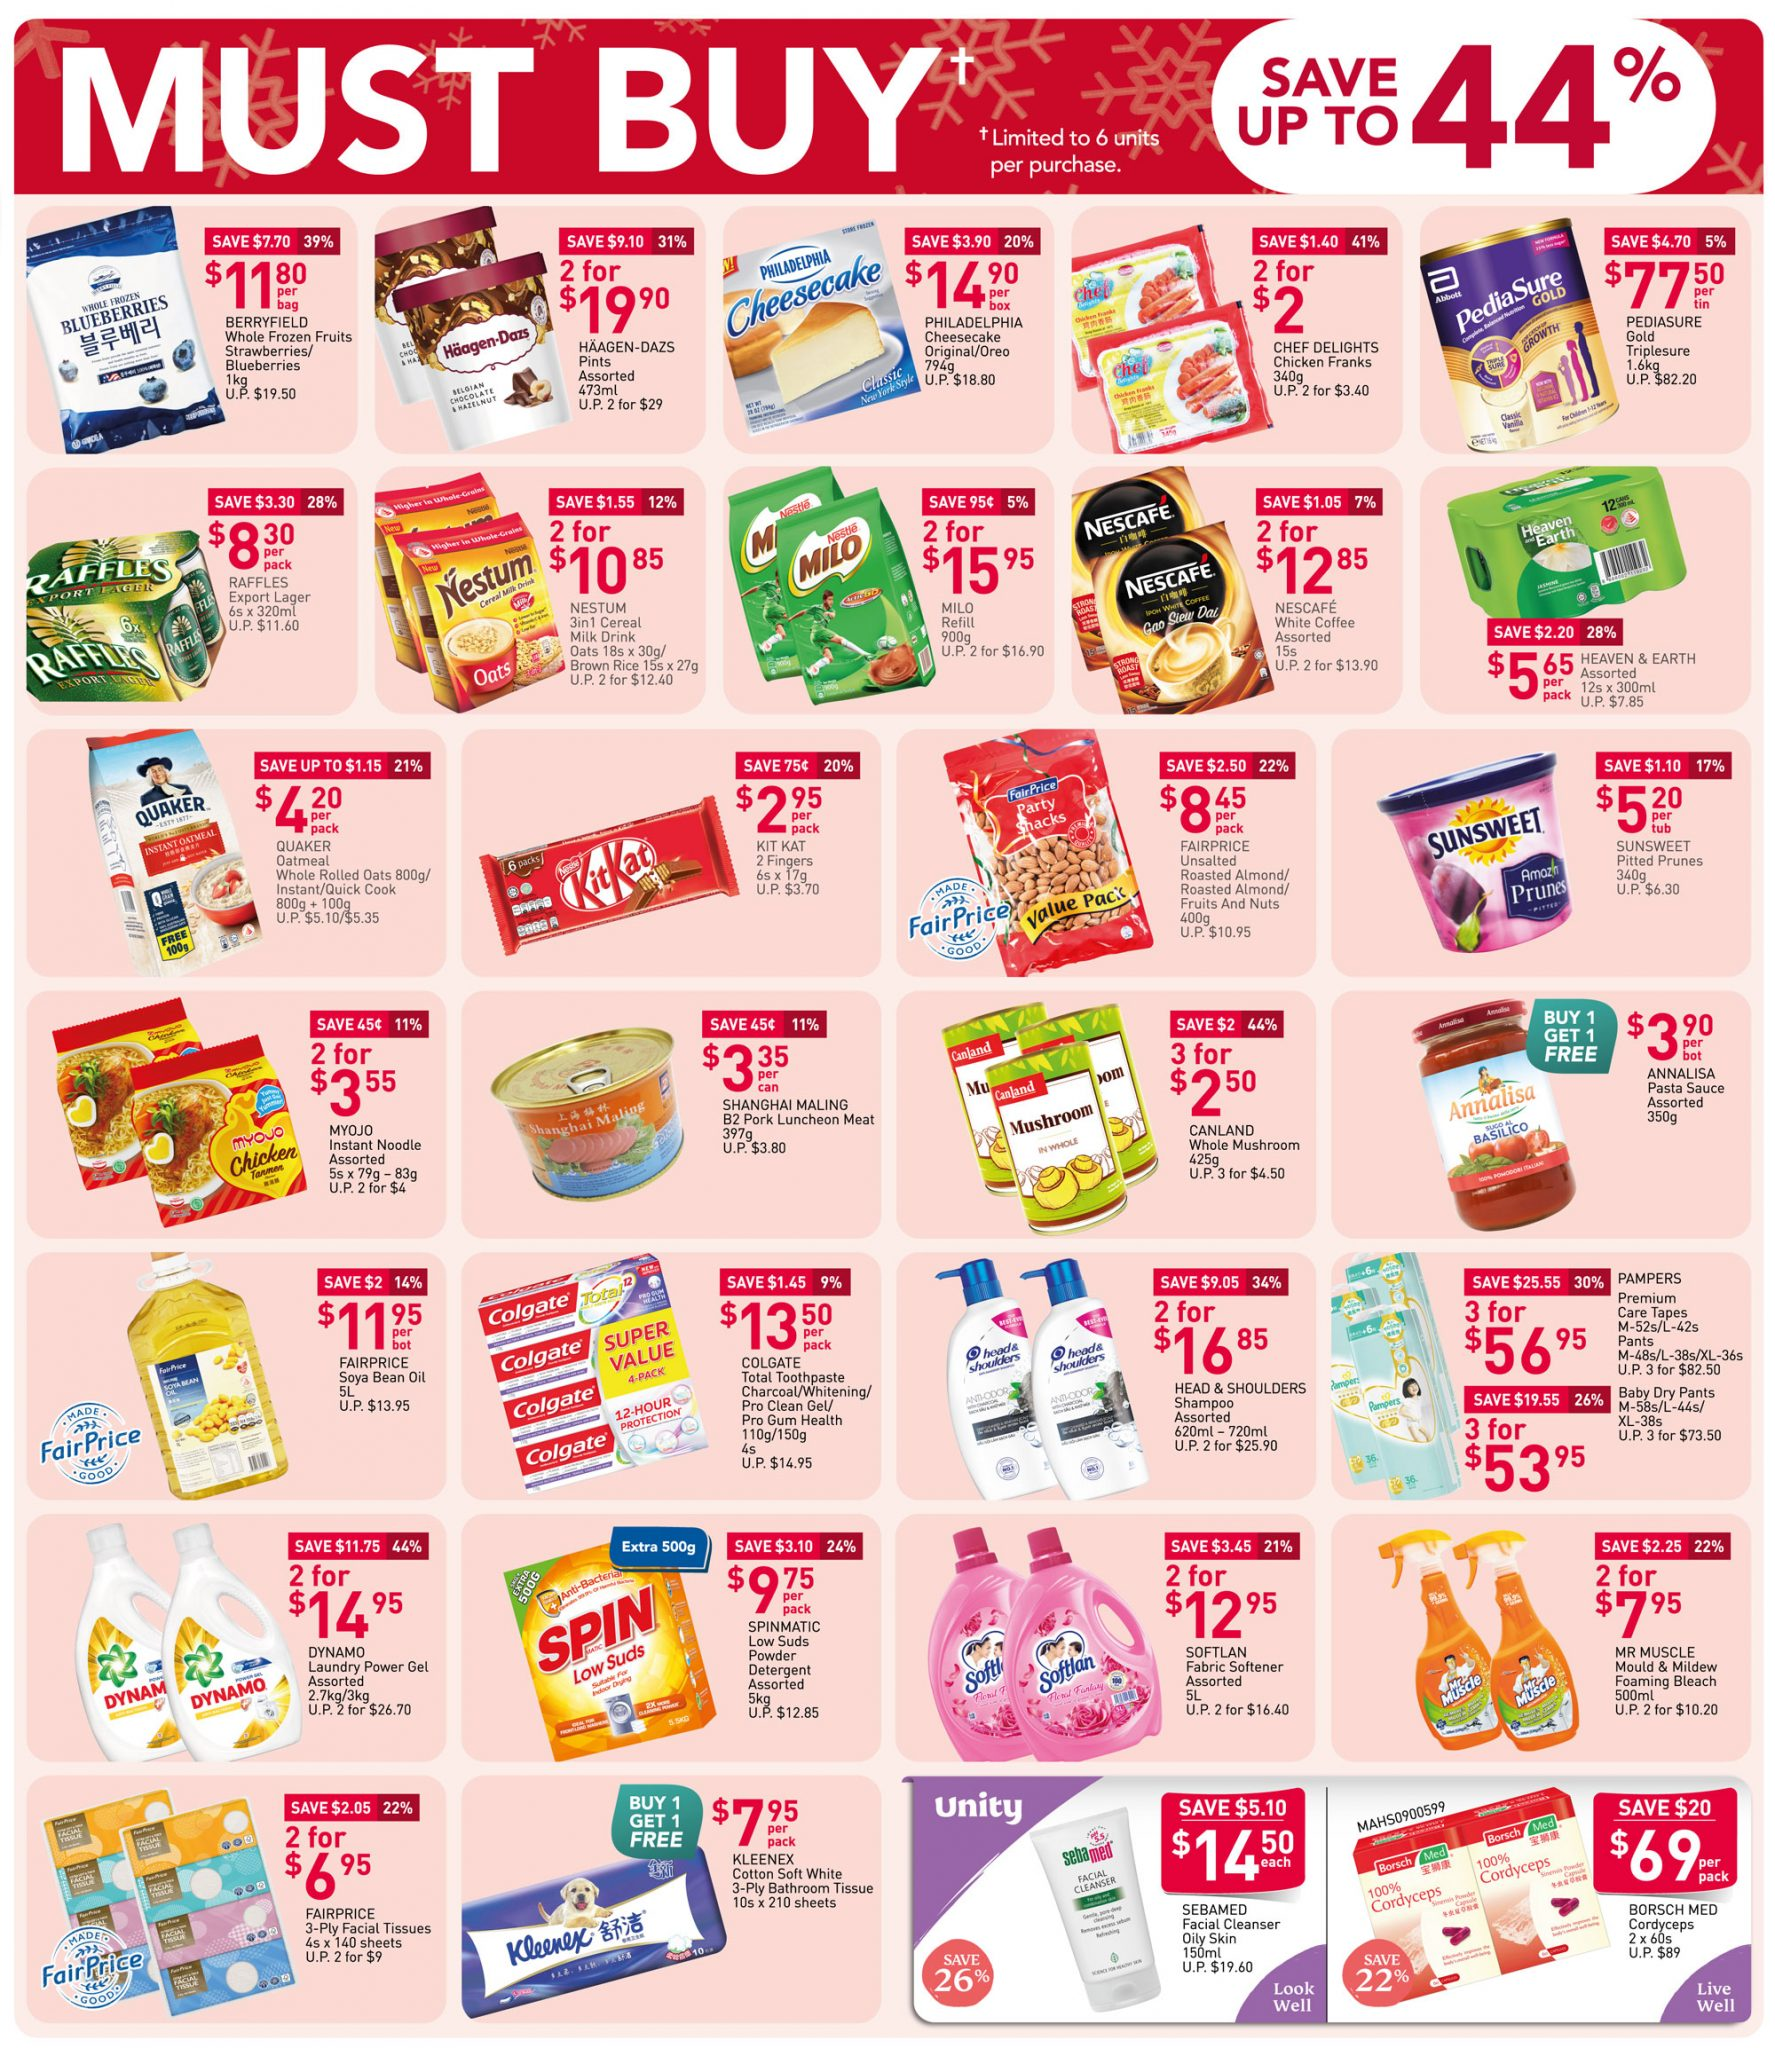 Must-buy items from now till 2 December 2020